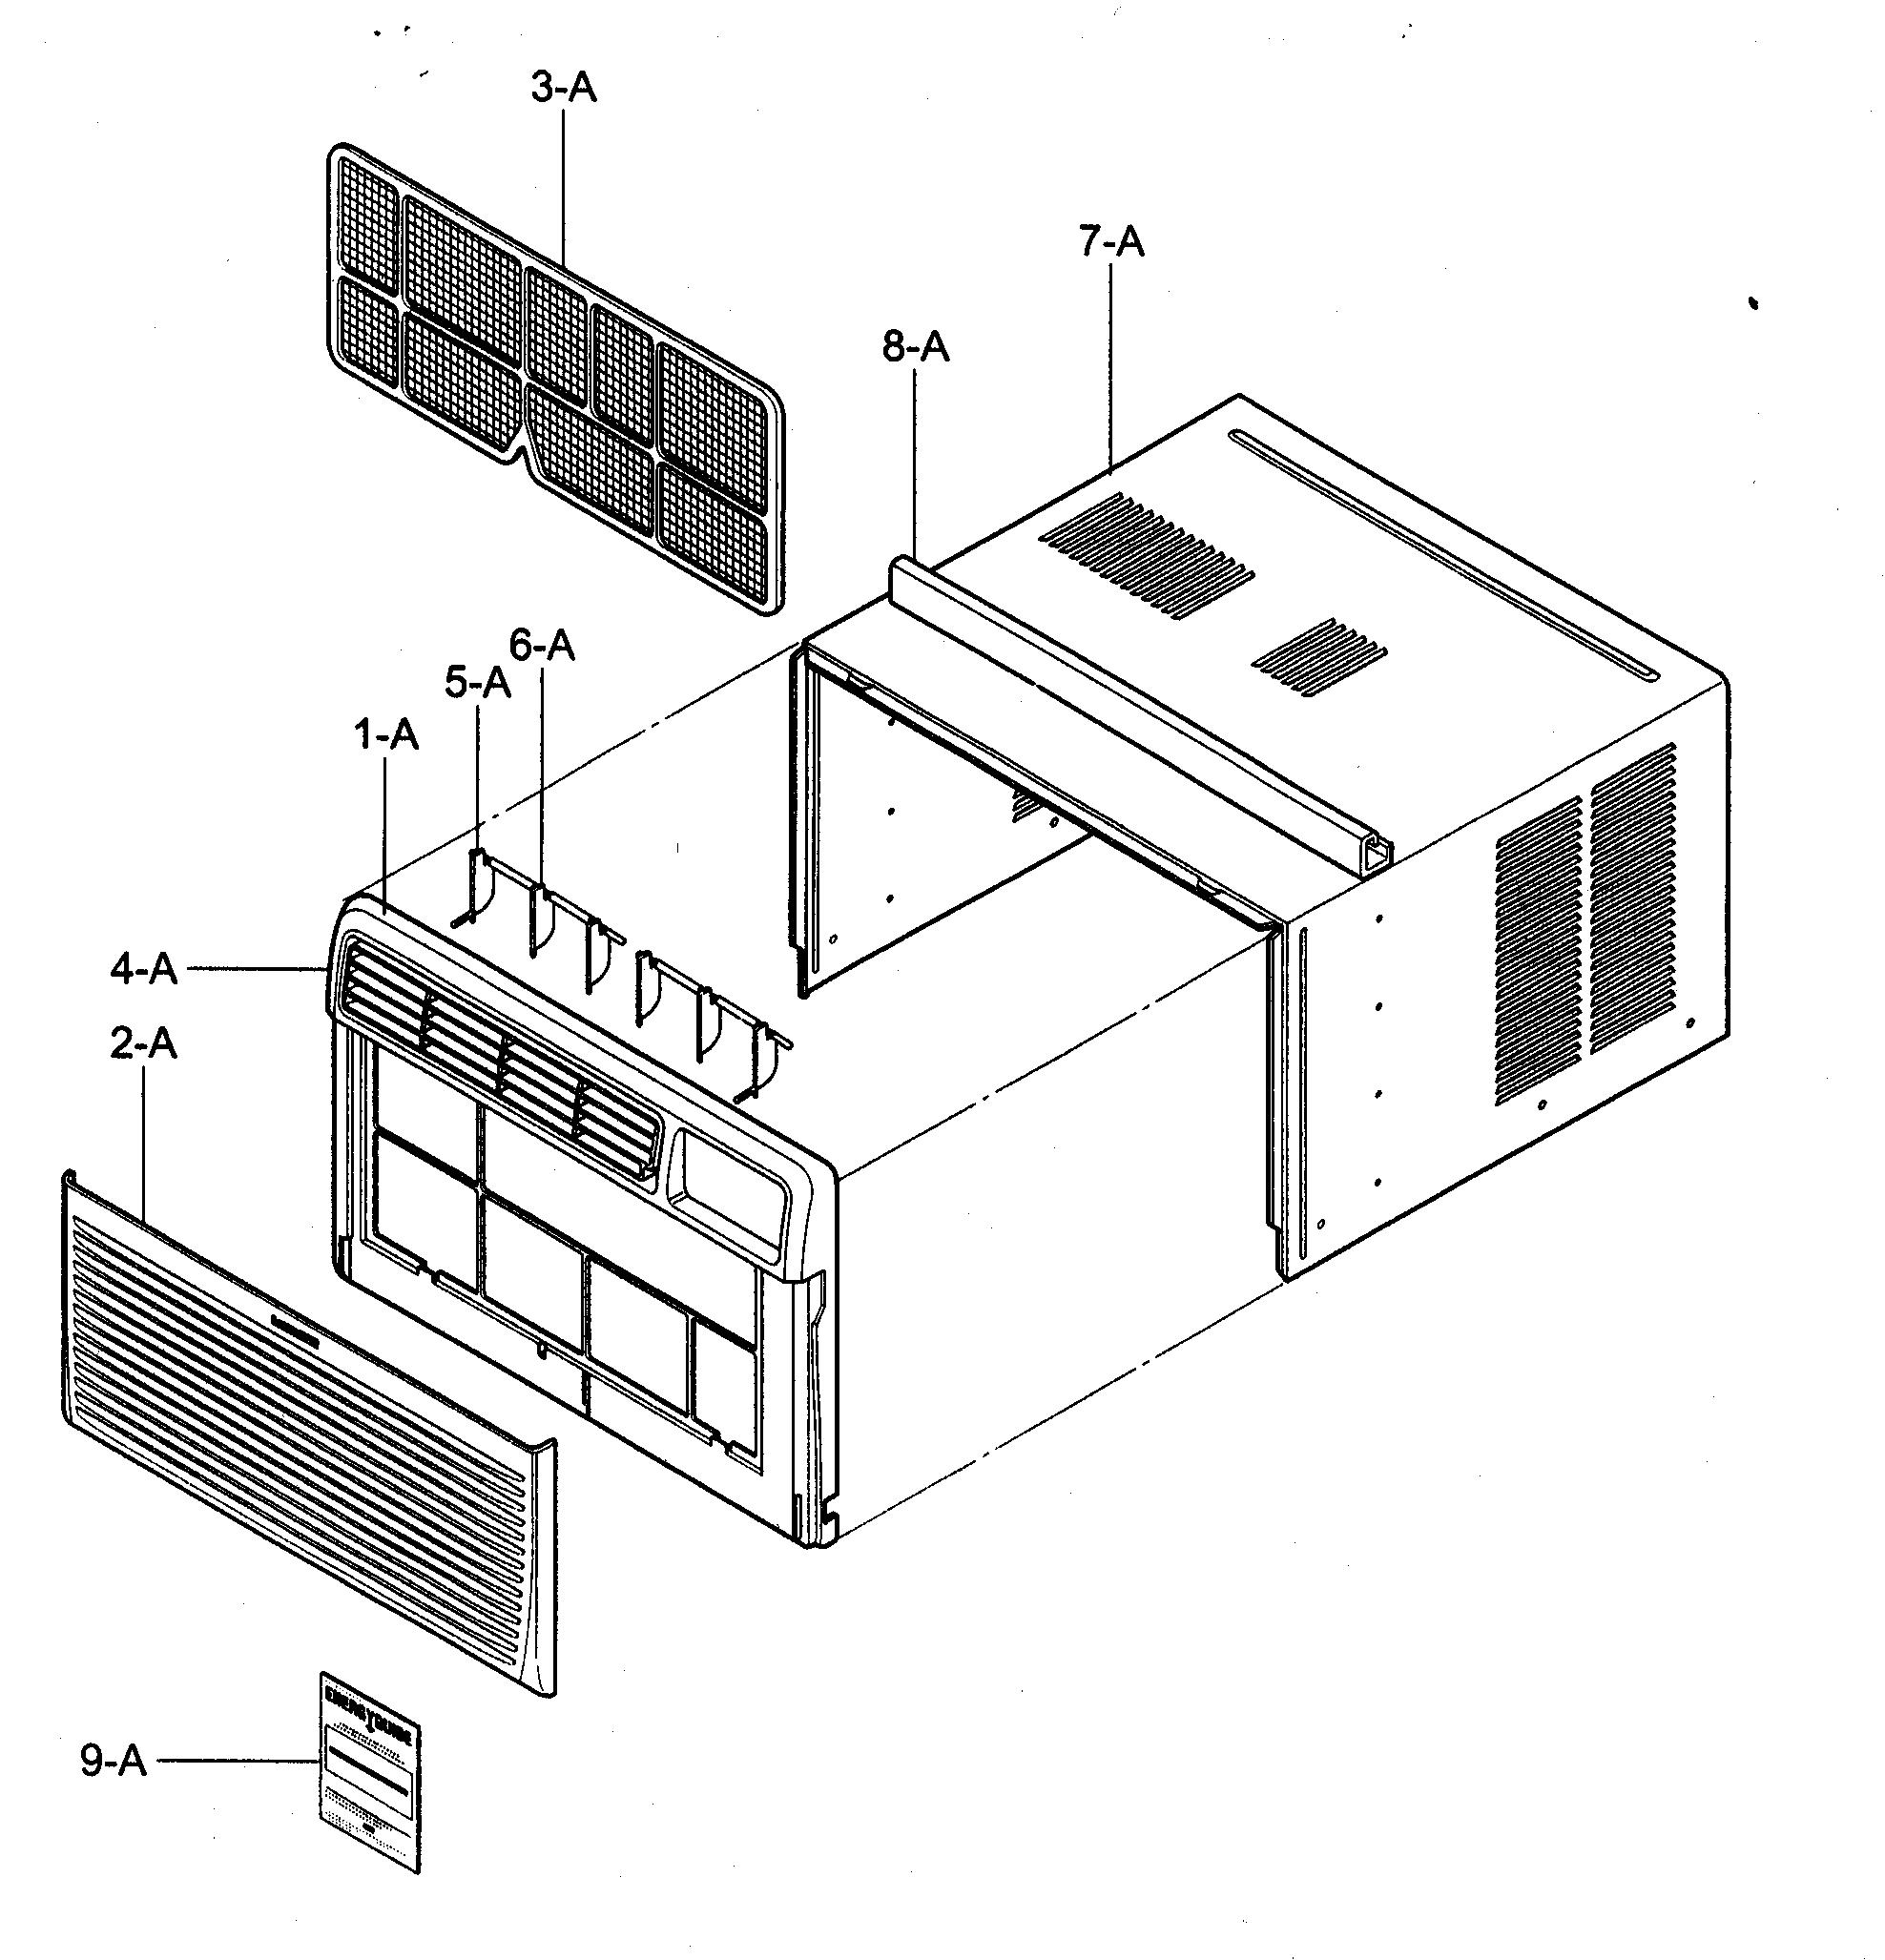 KENMORE Air Conditioner Control box assy Parts Model 58074082400  #393939